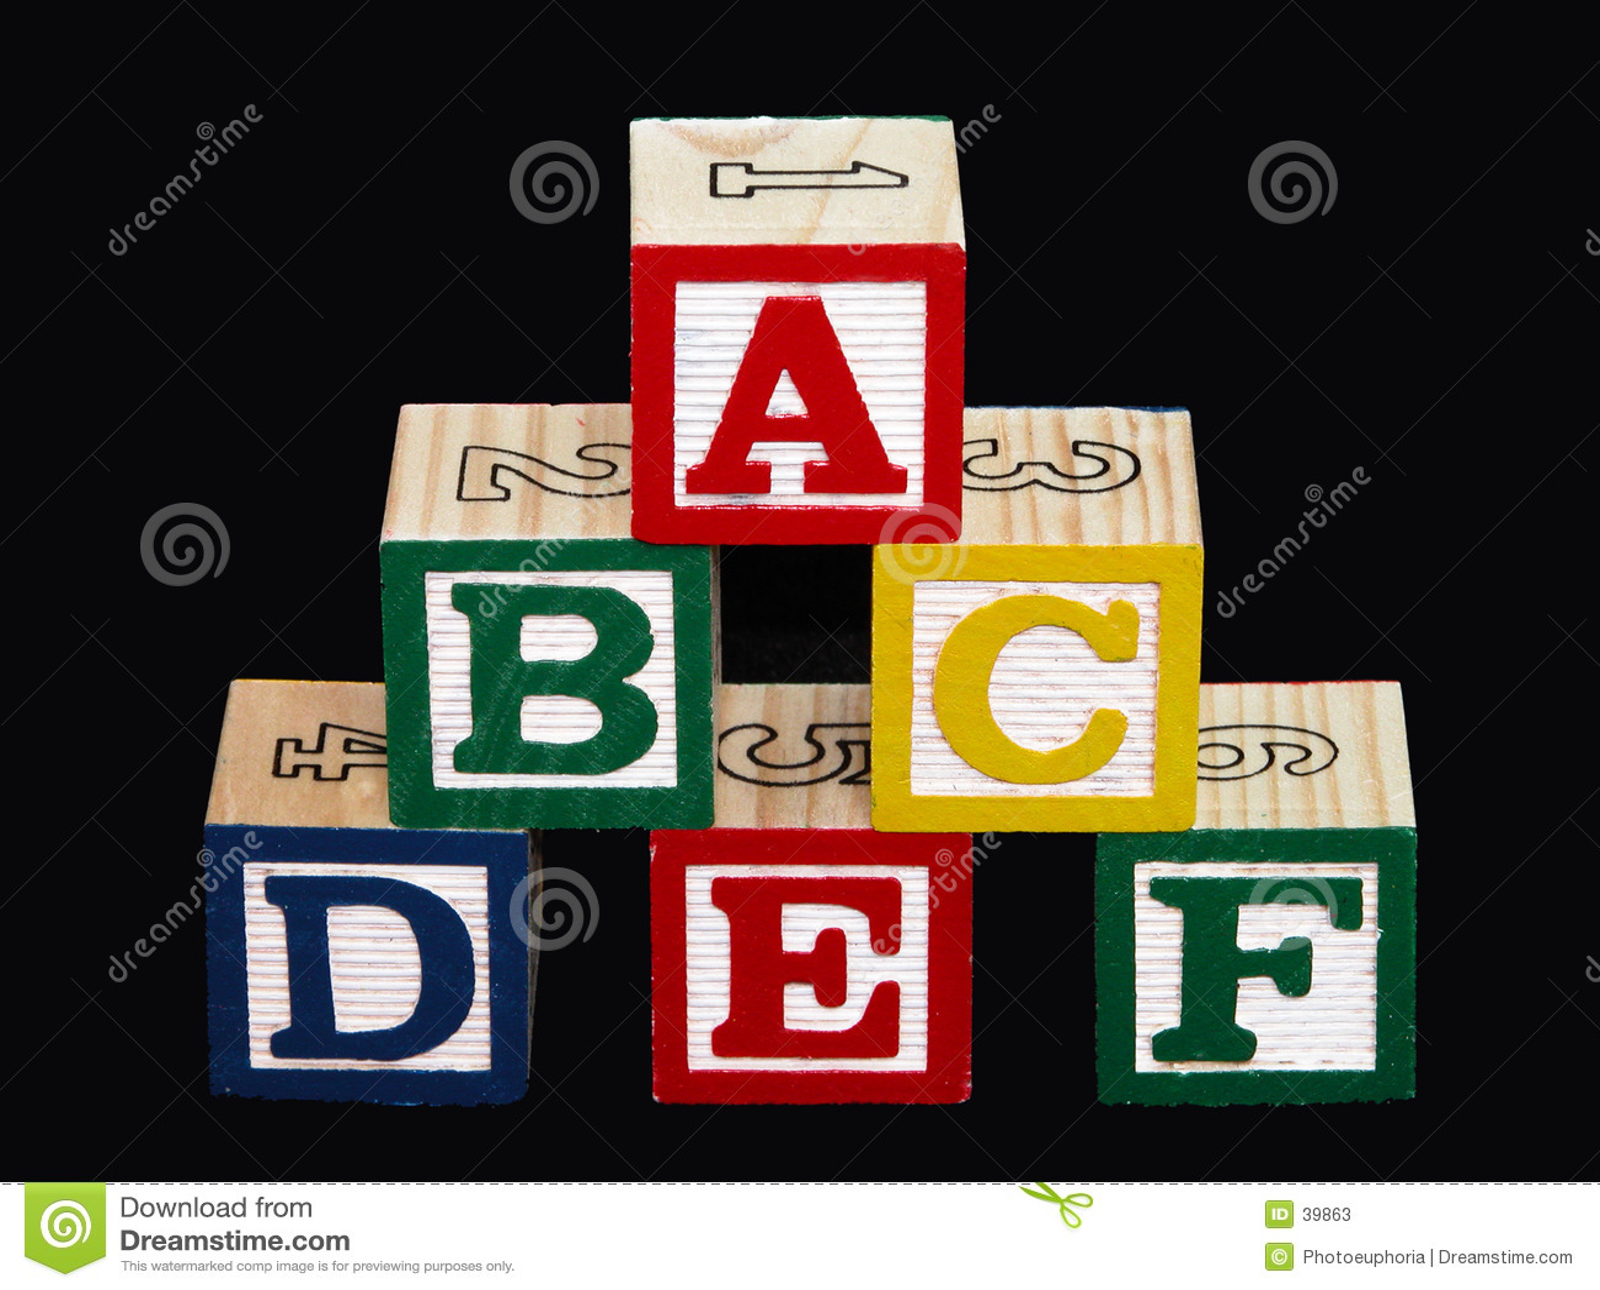 Alphabet-Blöcke (A-F) auf Schwarzem